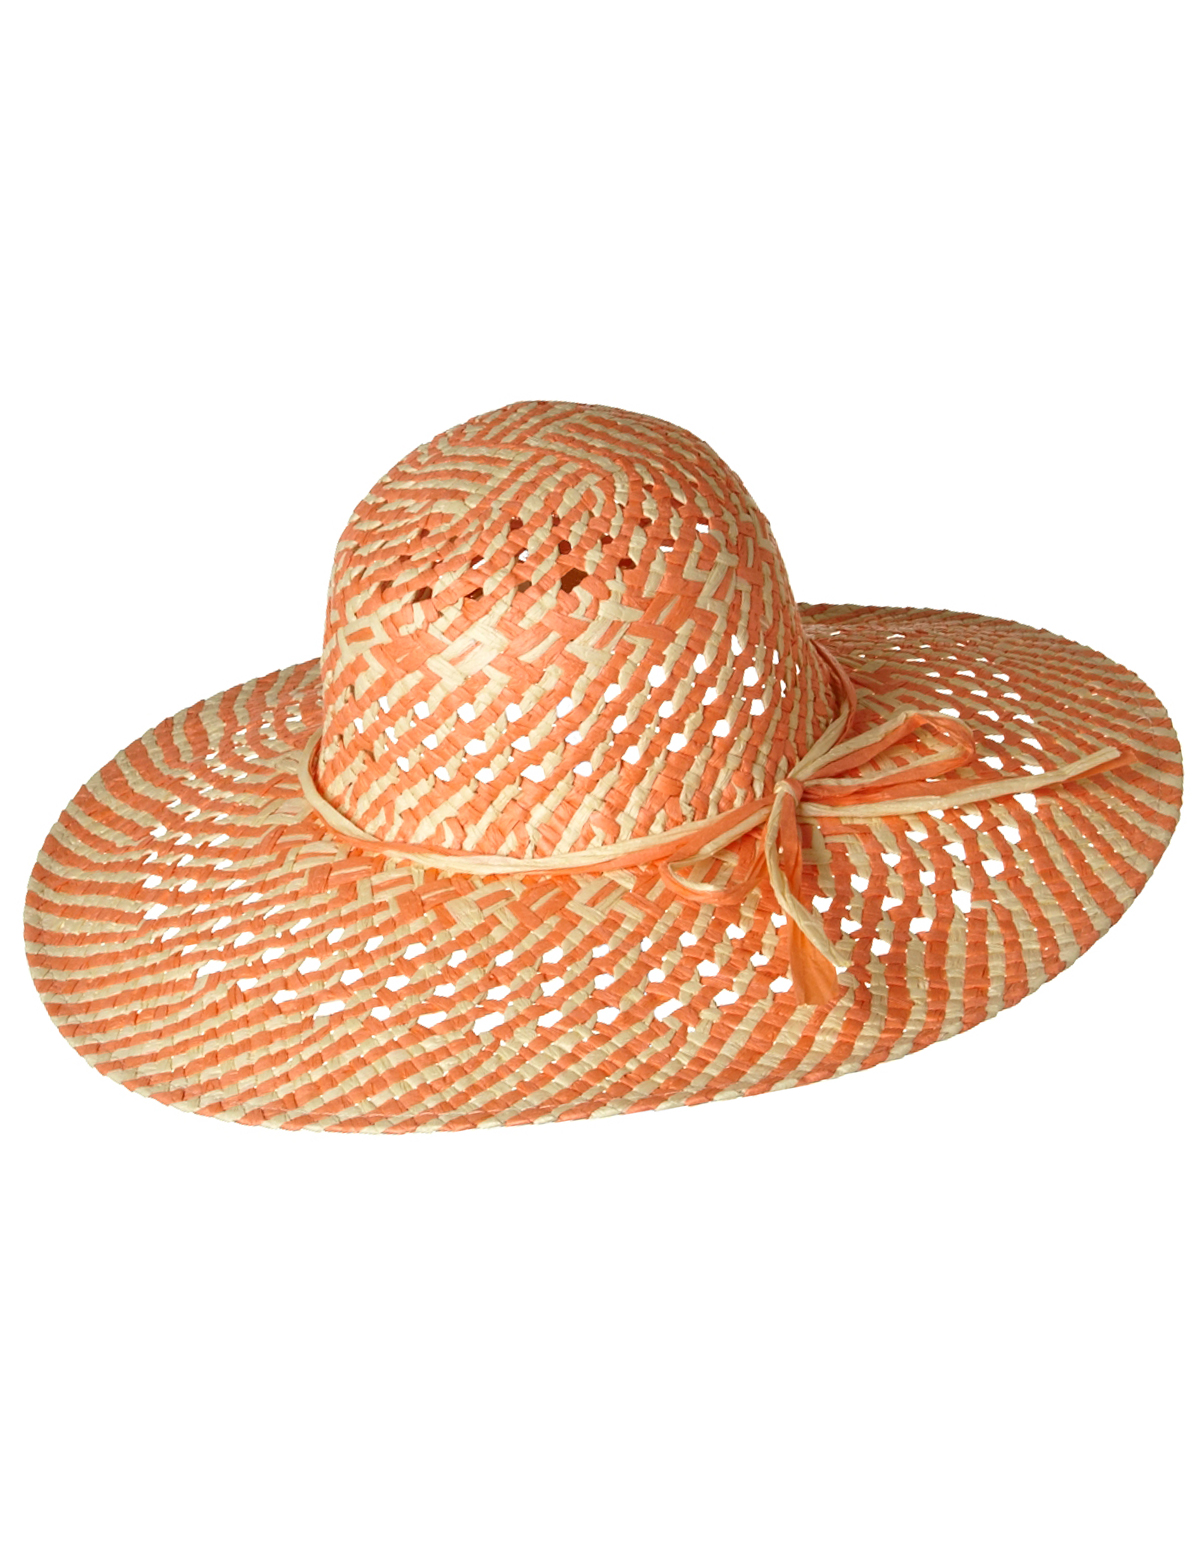 Coral Straw Sun Hat  849d0711c66